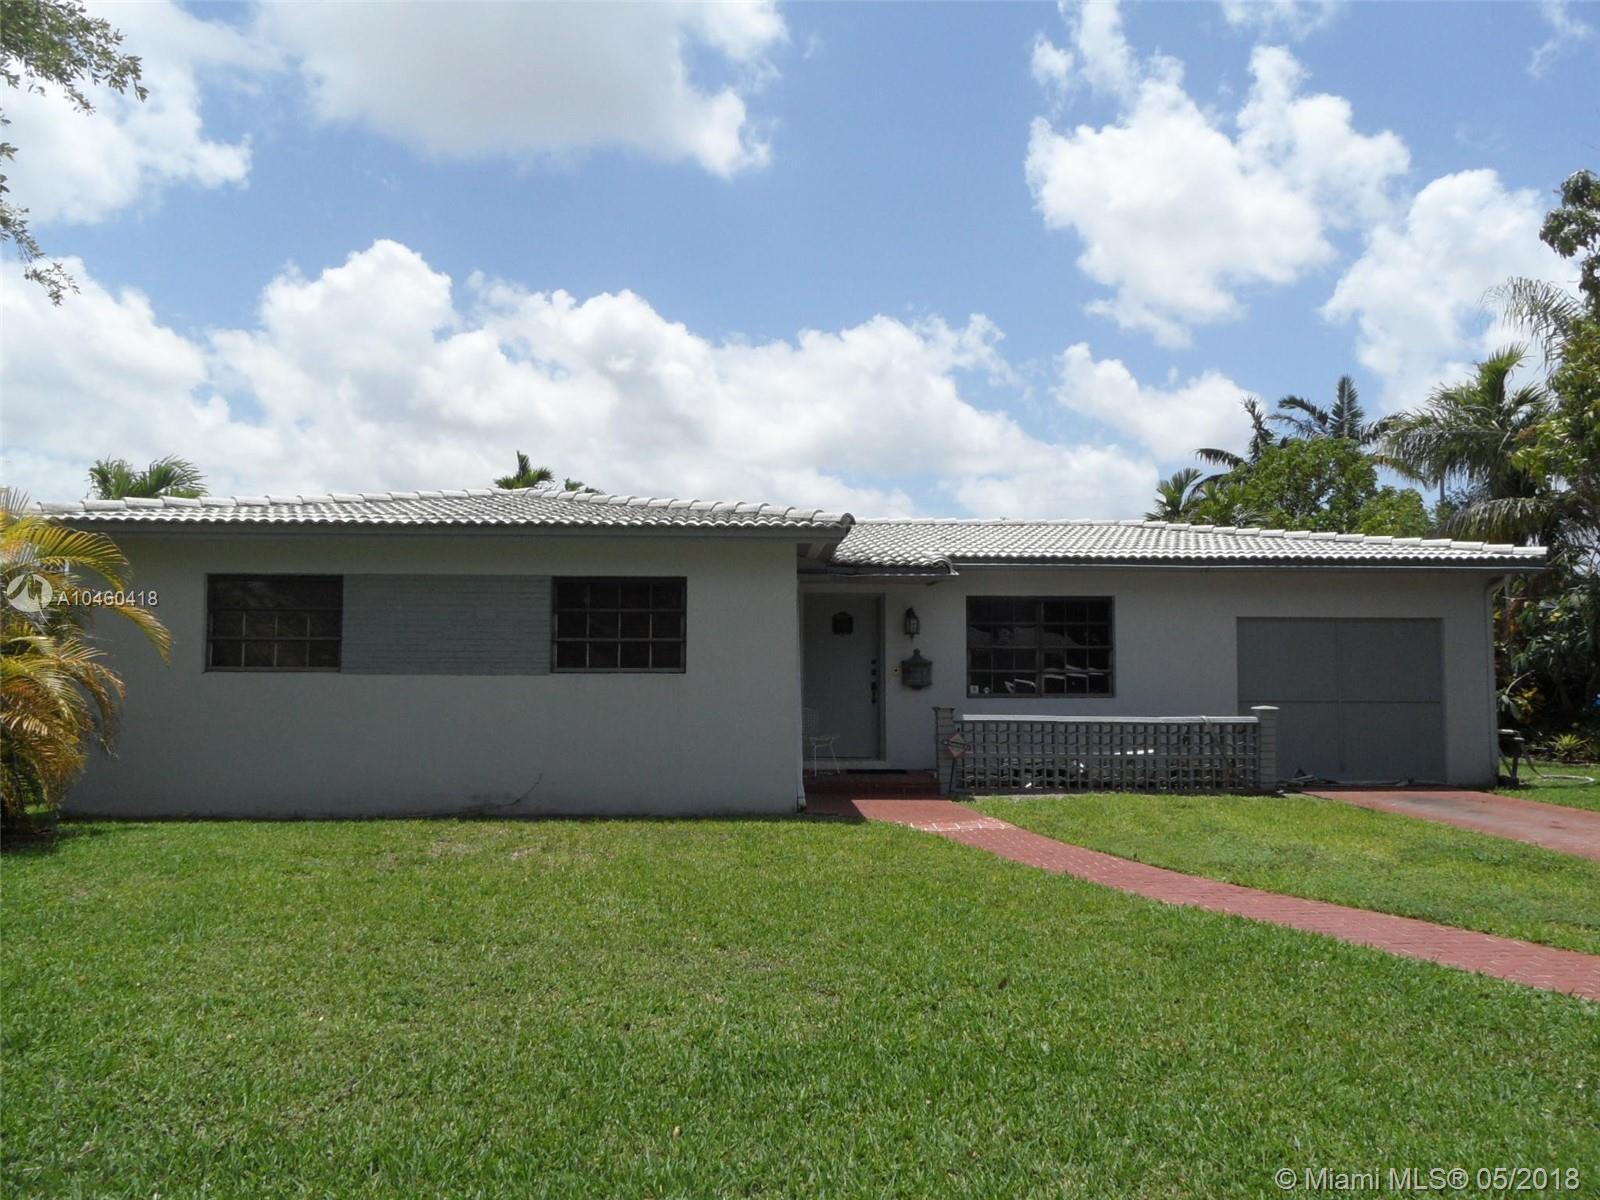 270 Linwood Dr, Miami Springs FL, 33166